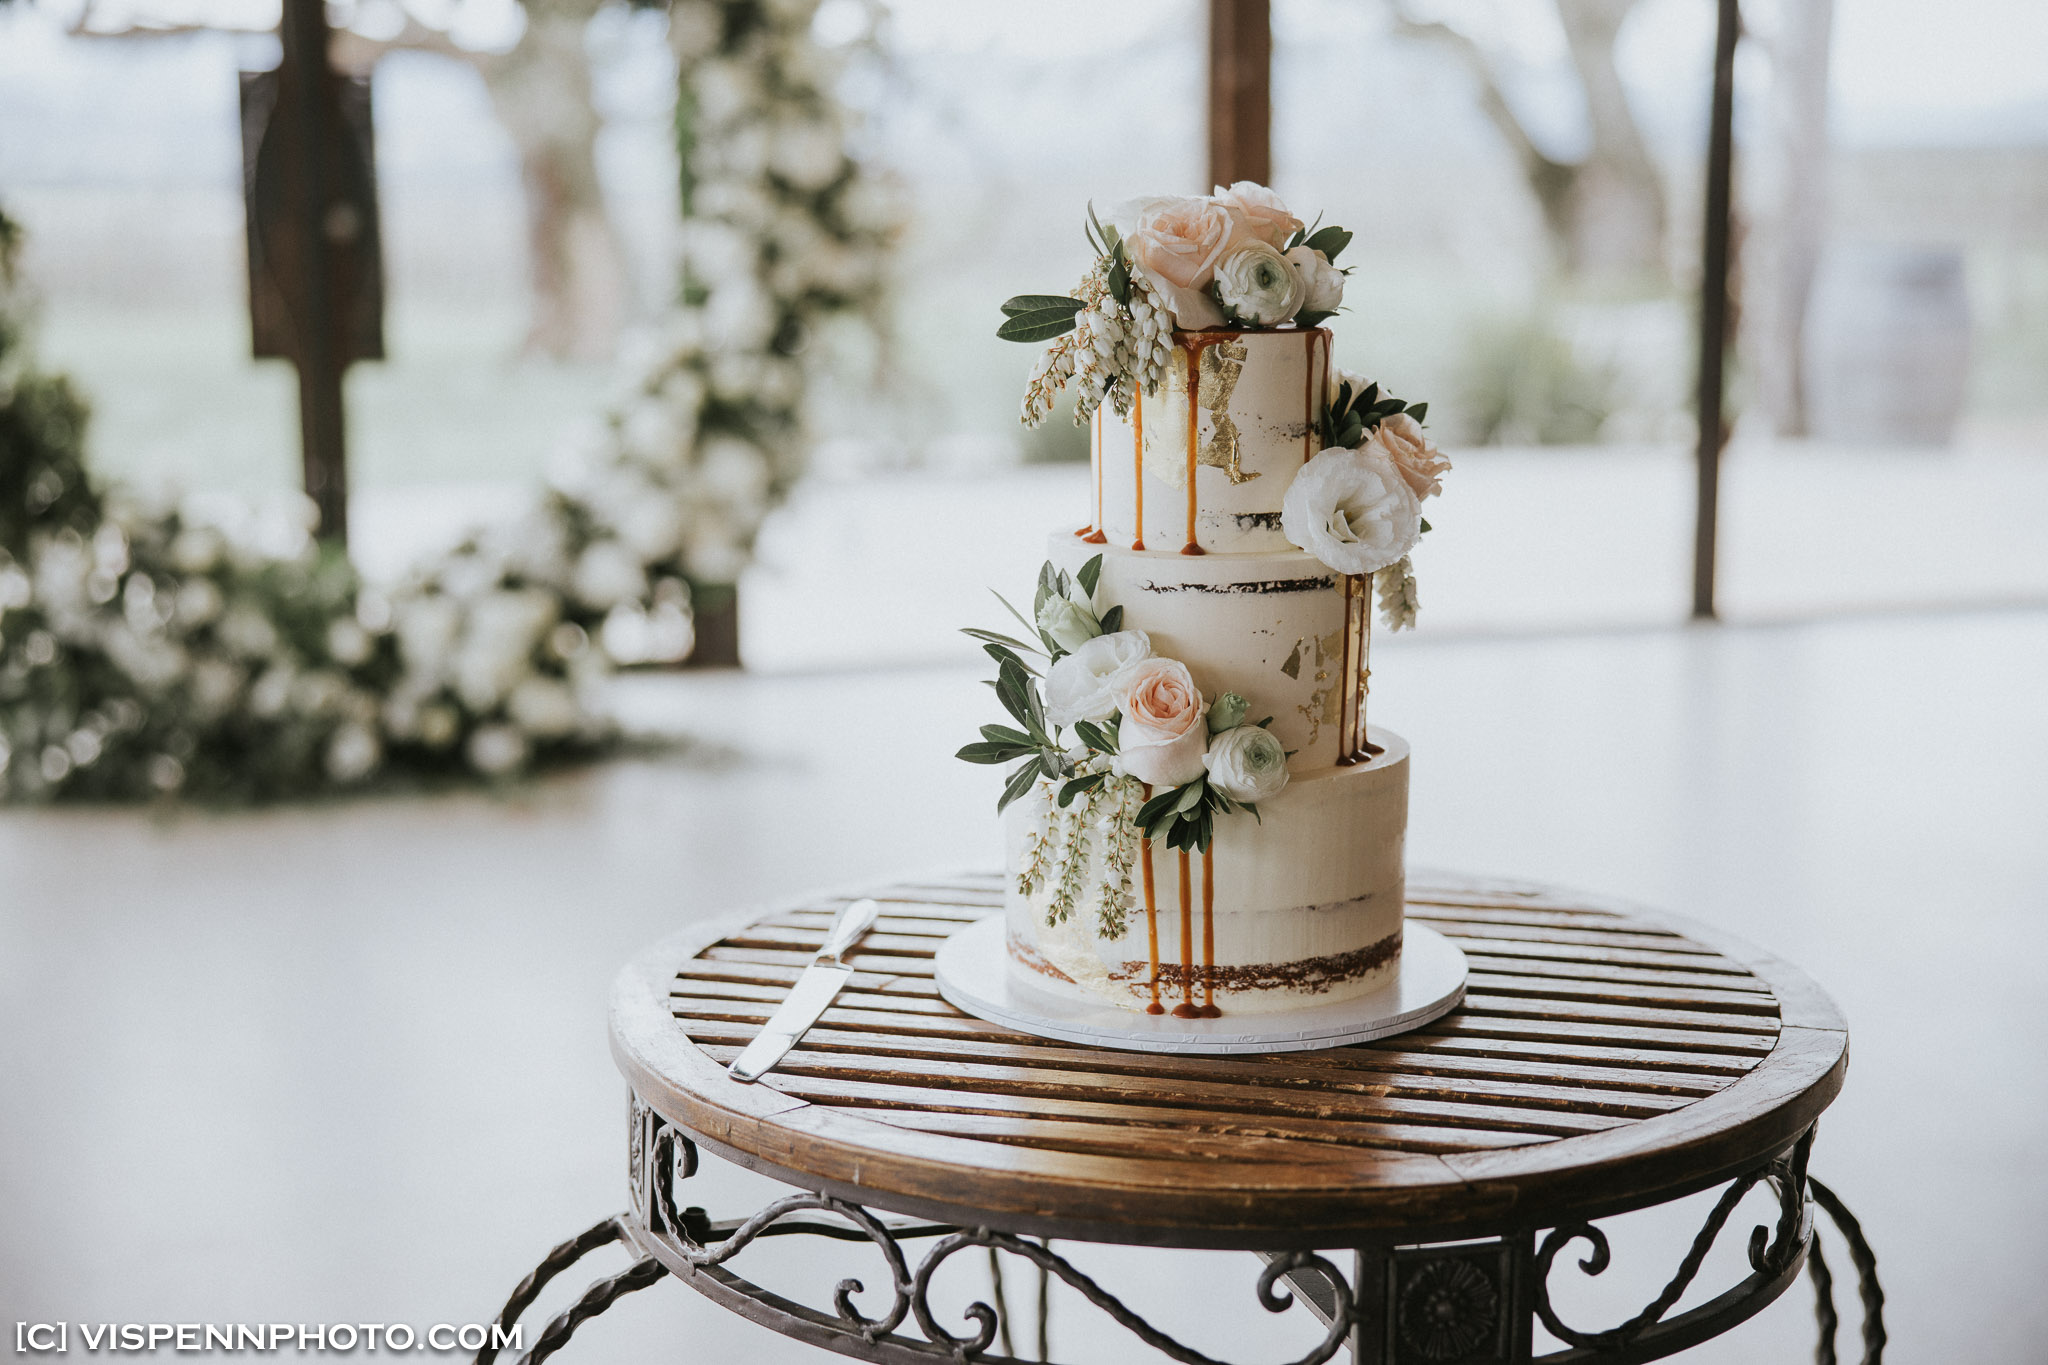 WEDDING DAY Photography Melbourne LeanneWesley 07758 1P EOSR ZHPENN